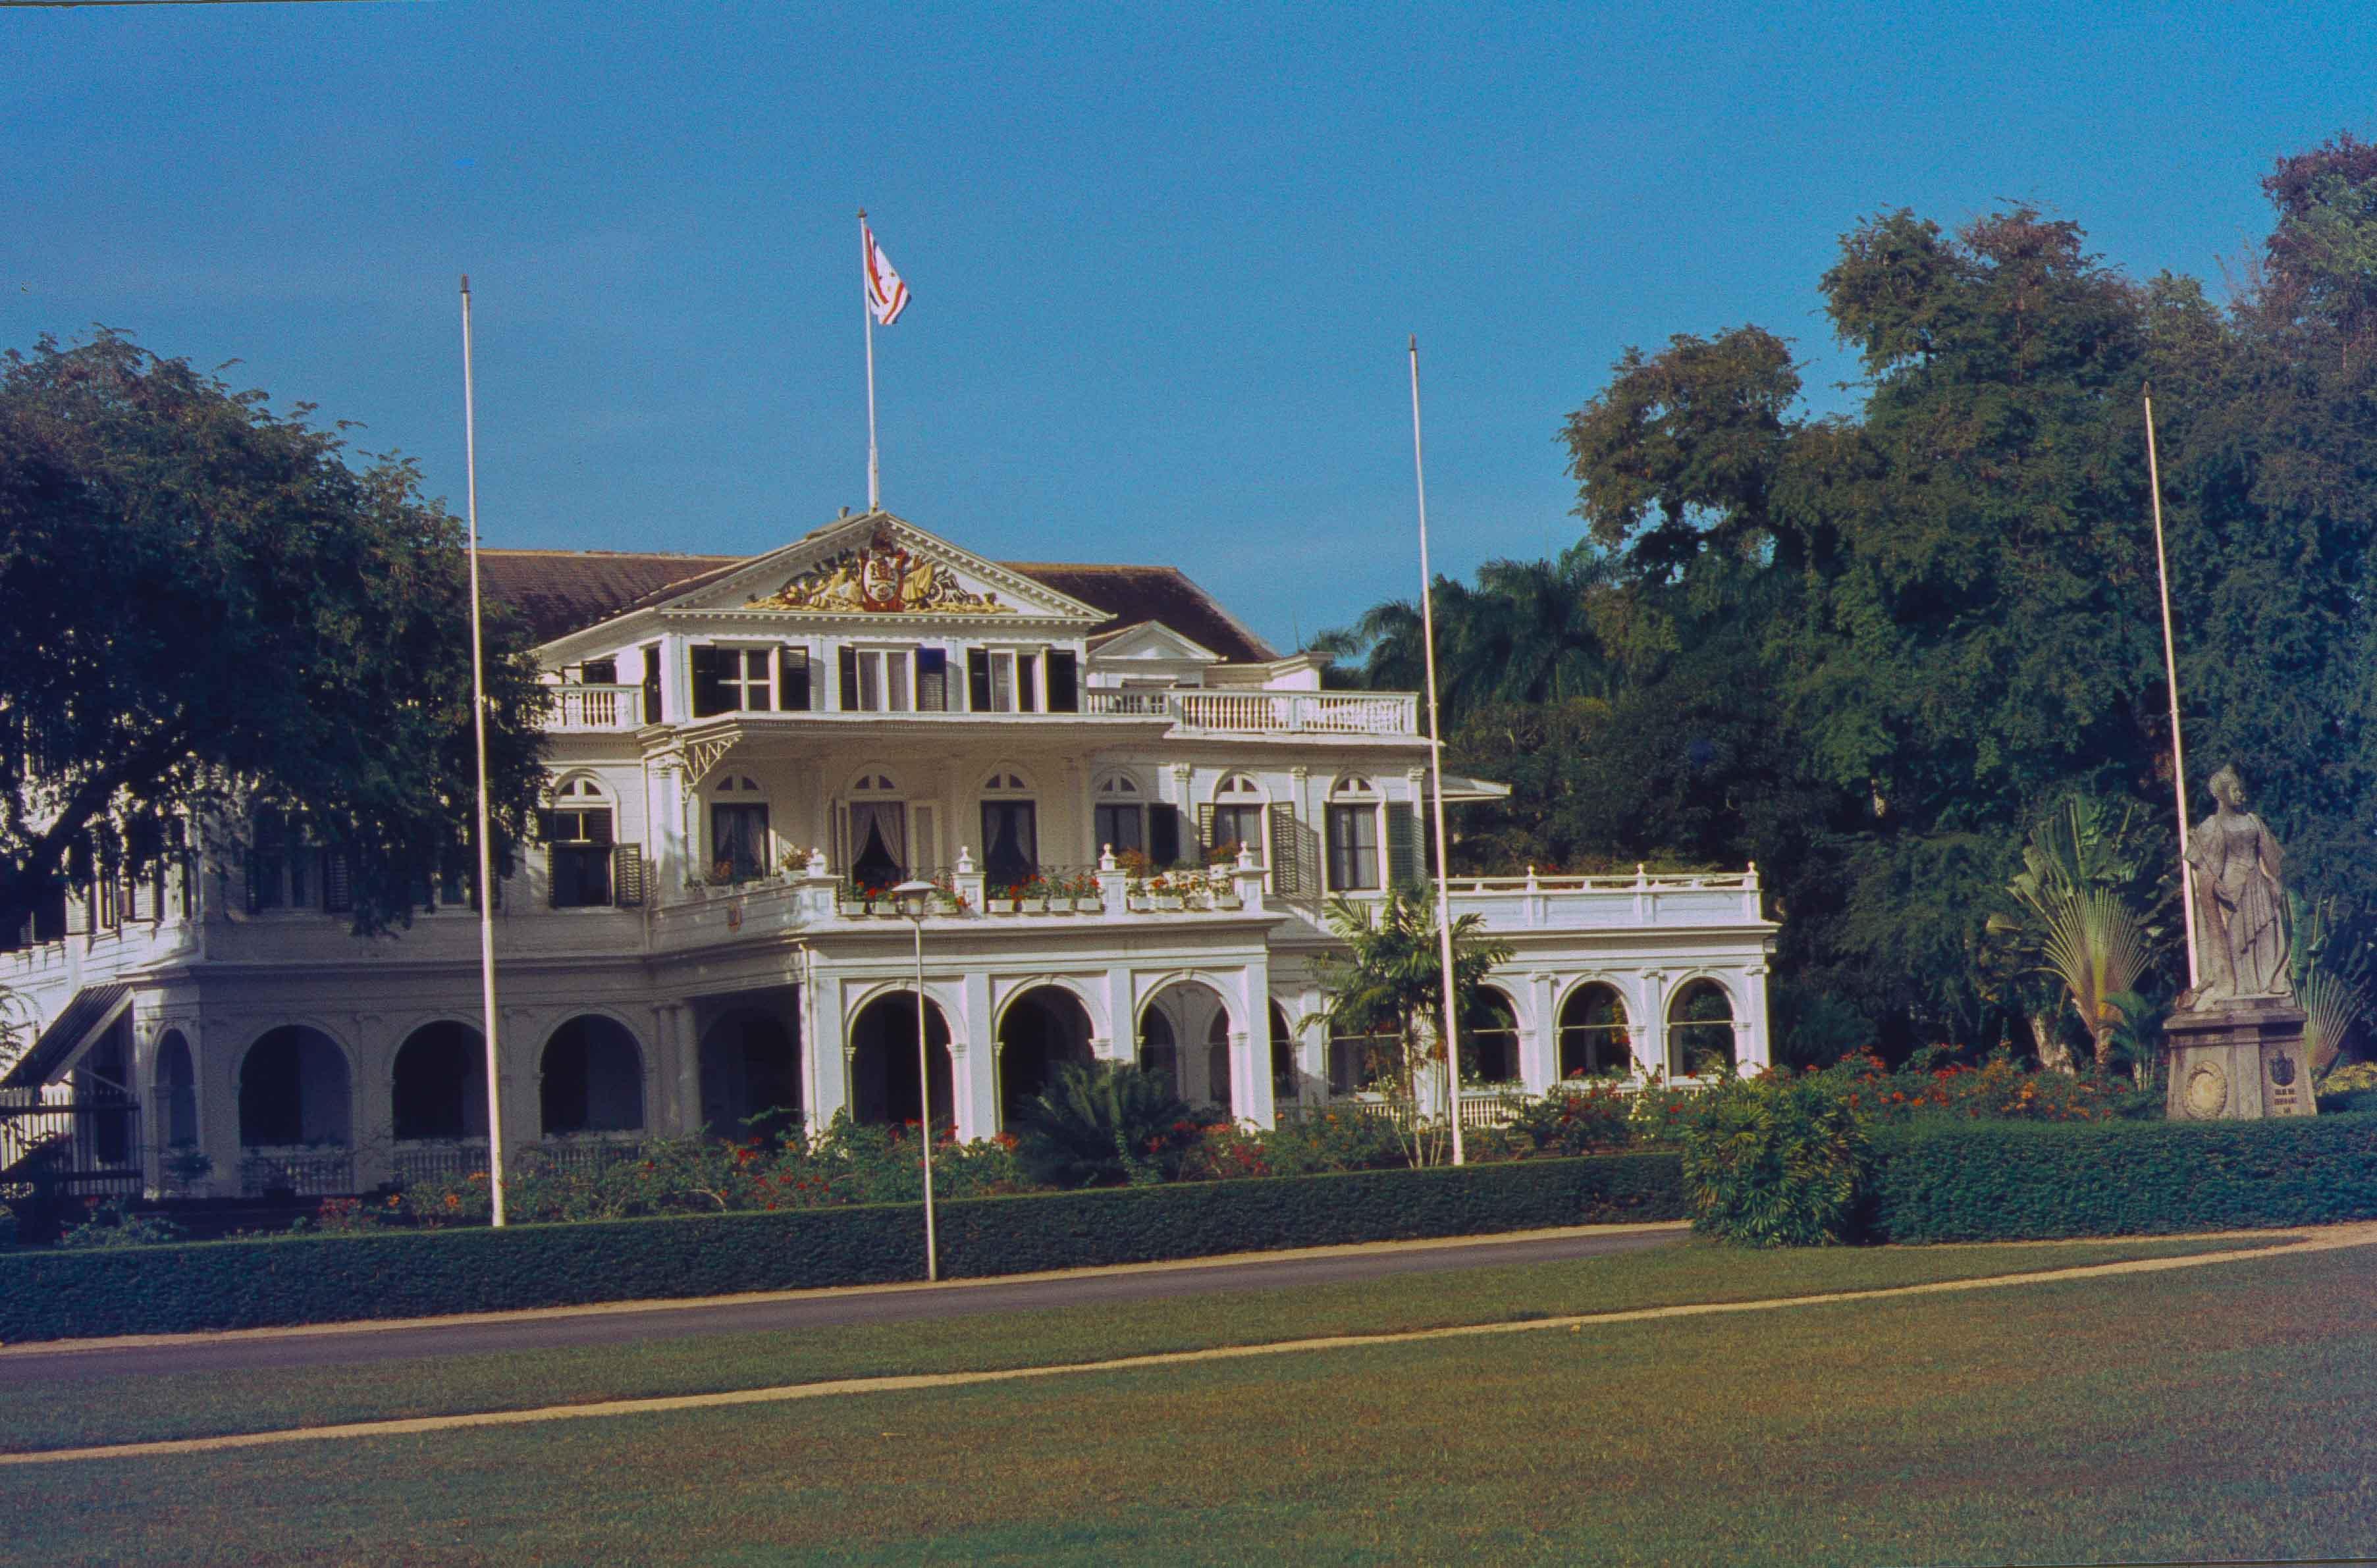 231. Suriname